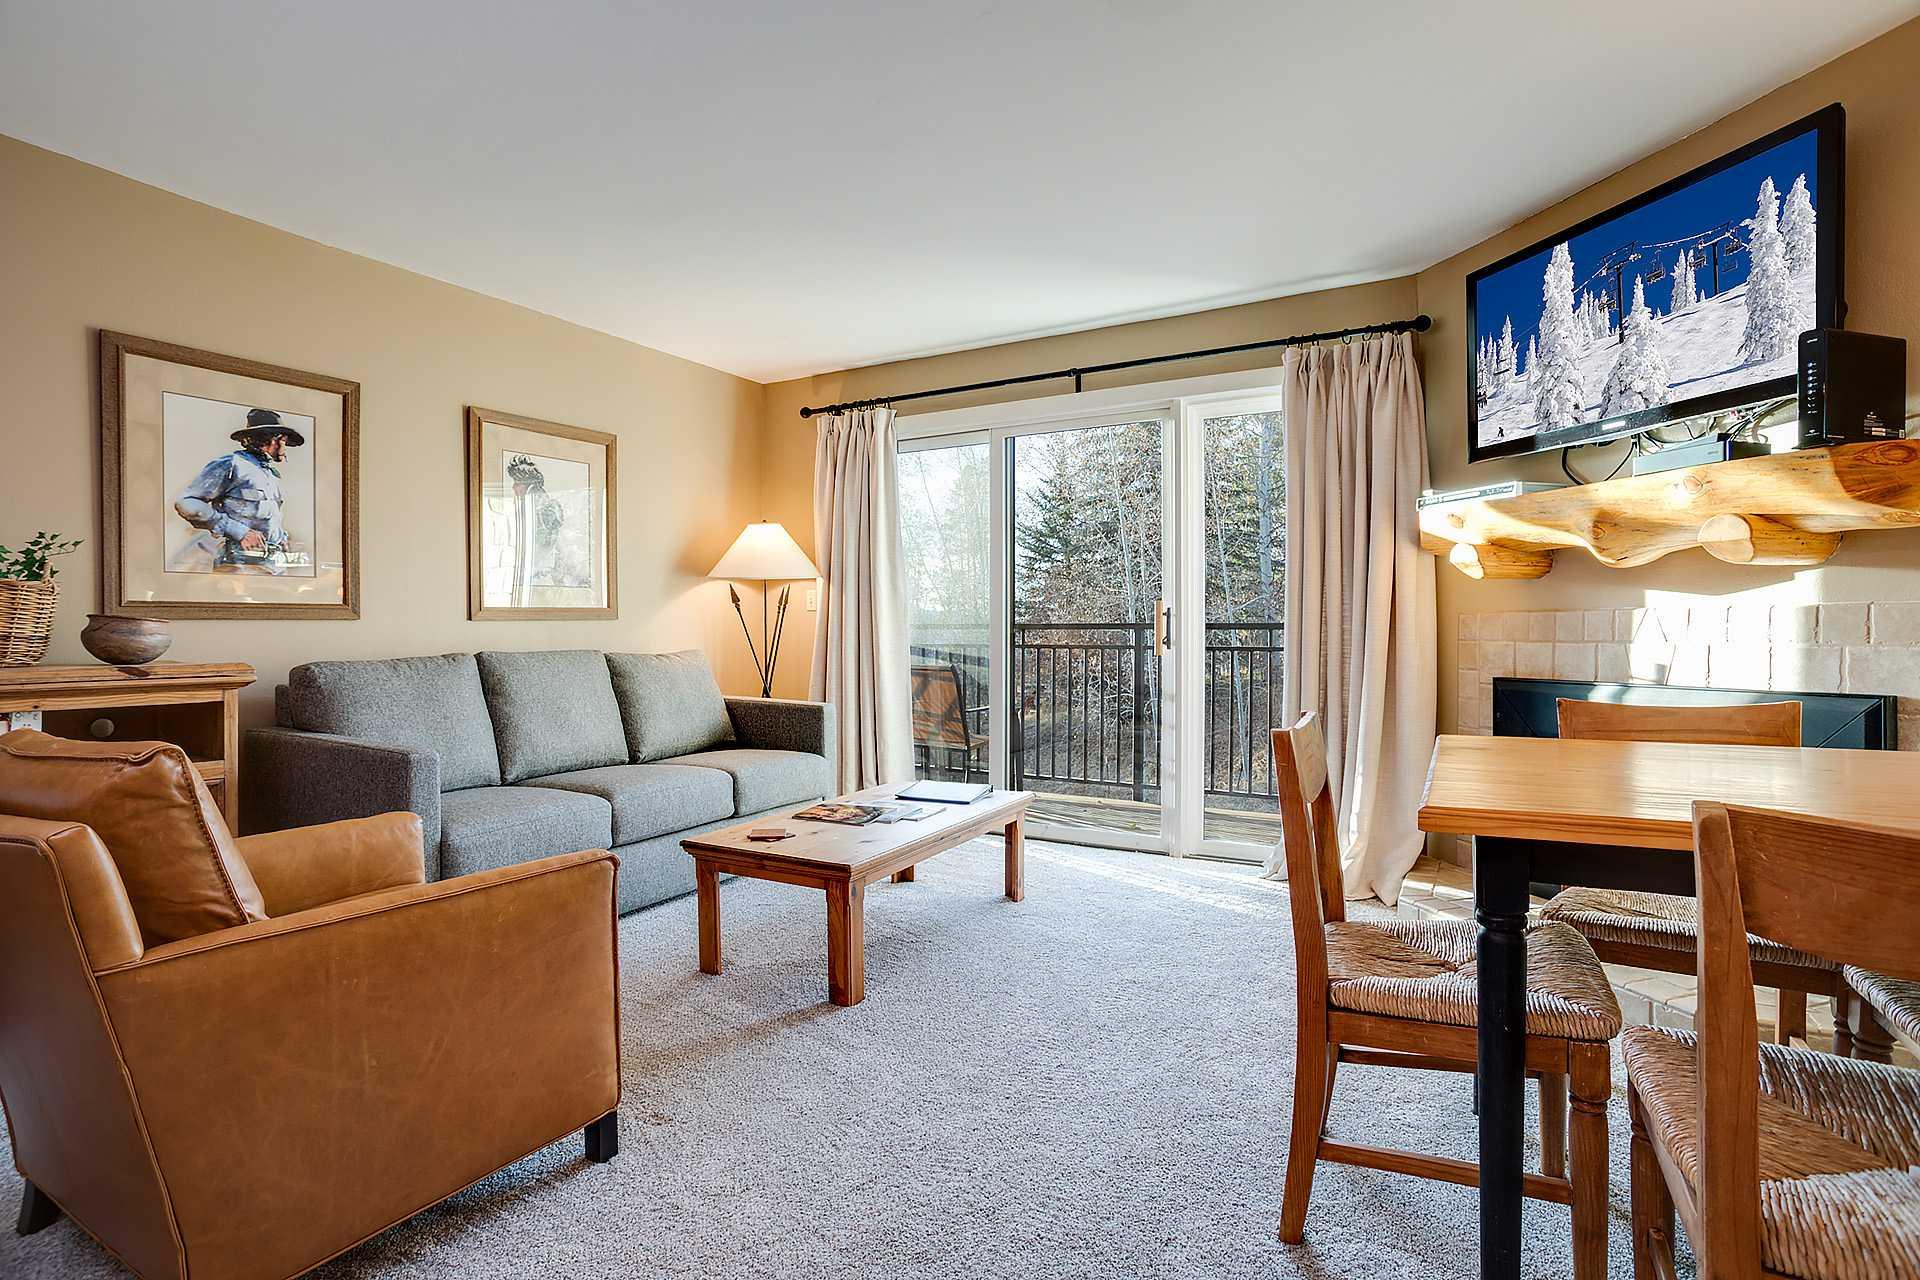 SL207 - Scandinavian Lodge and Condominiums